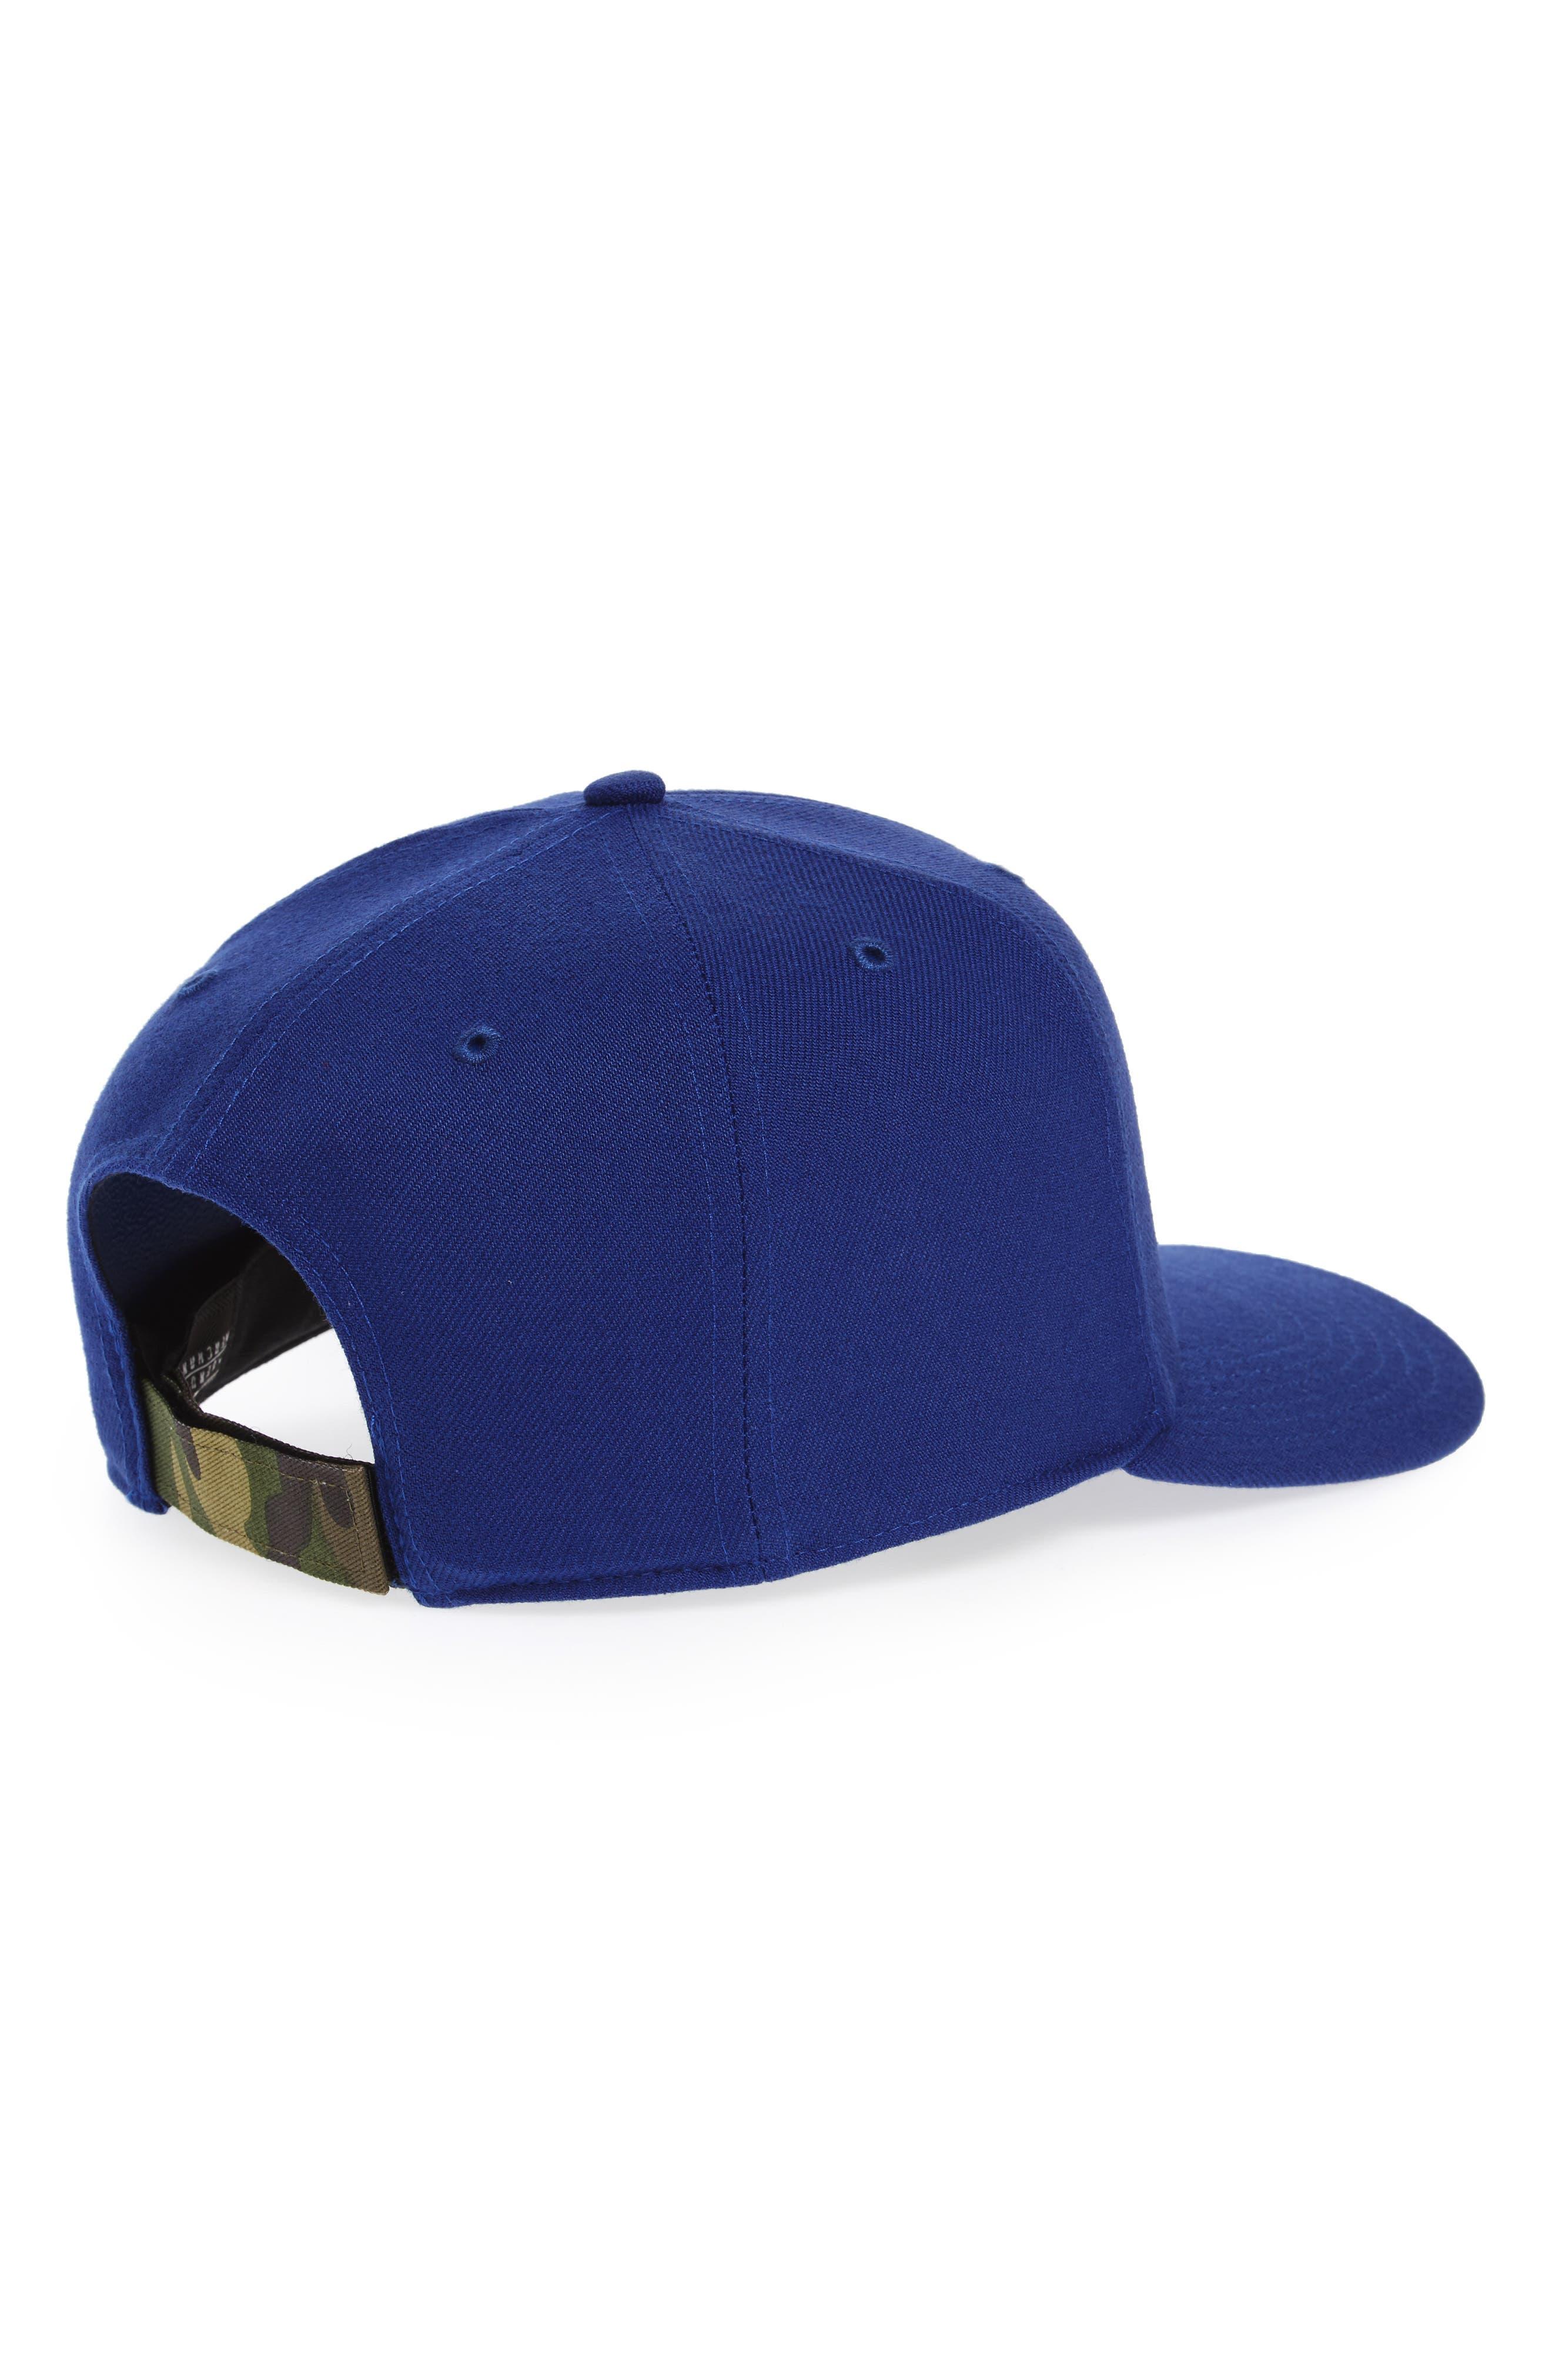 Los Angeles Dodgers - Camouflage Baseball Cap,                             Alternate thumbnail 2, color,                             Royal